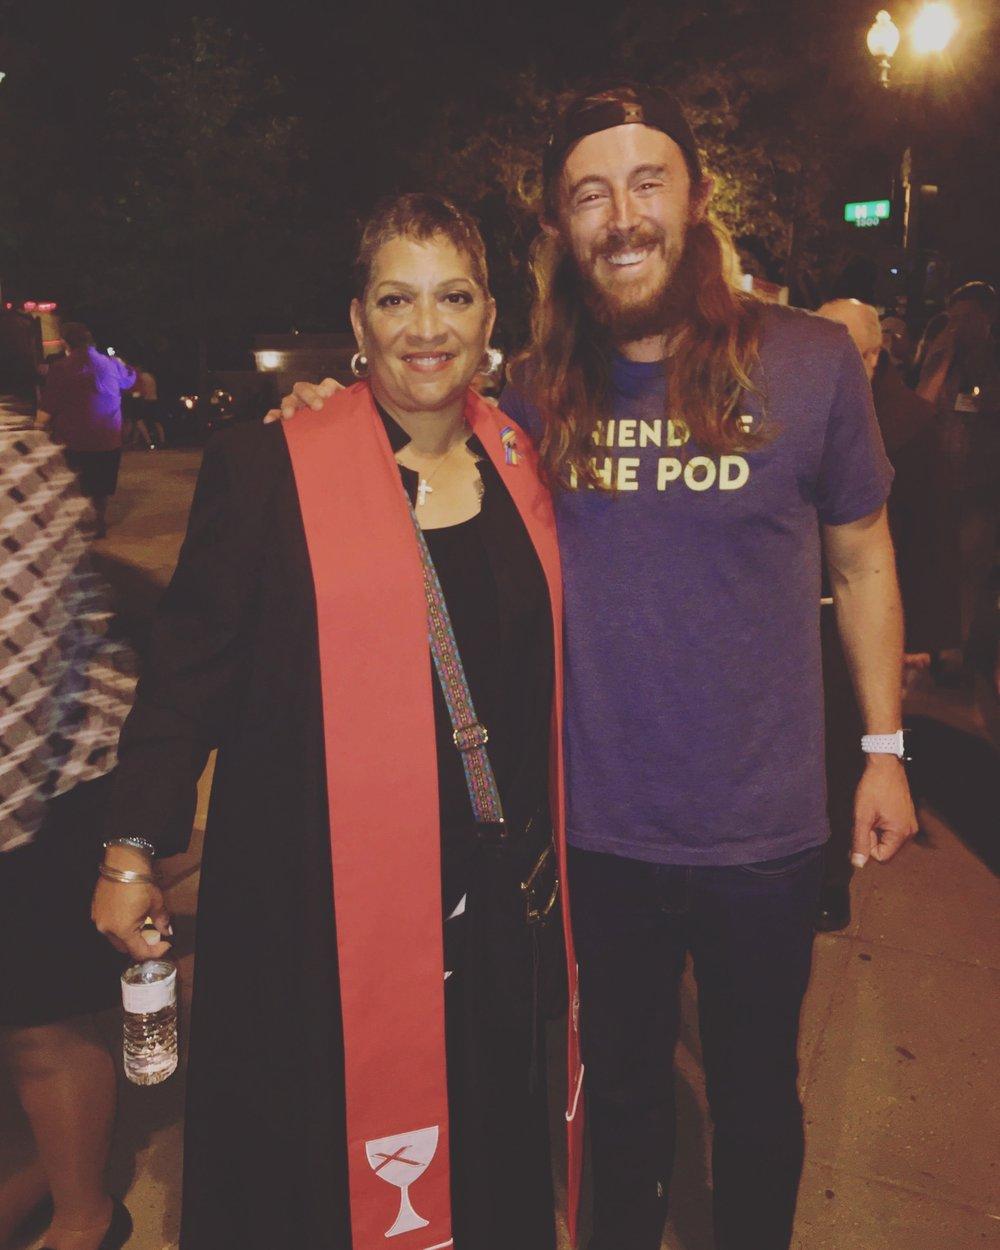 Teresa-Hord-Owens-Ryan-Pryor-Washington-DC-Reclaiming-Jesus-Protest-Rally-jpeg.jpg